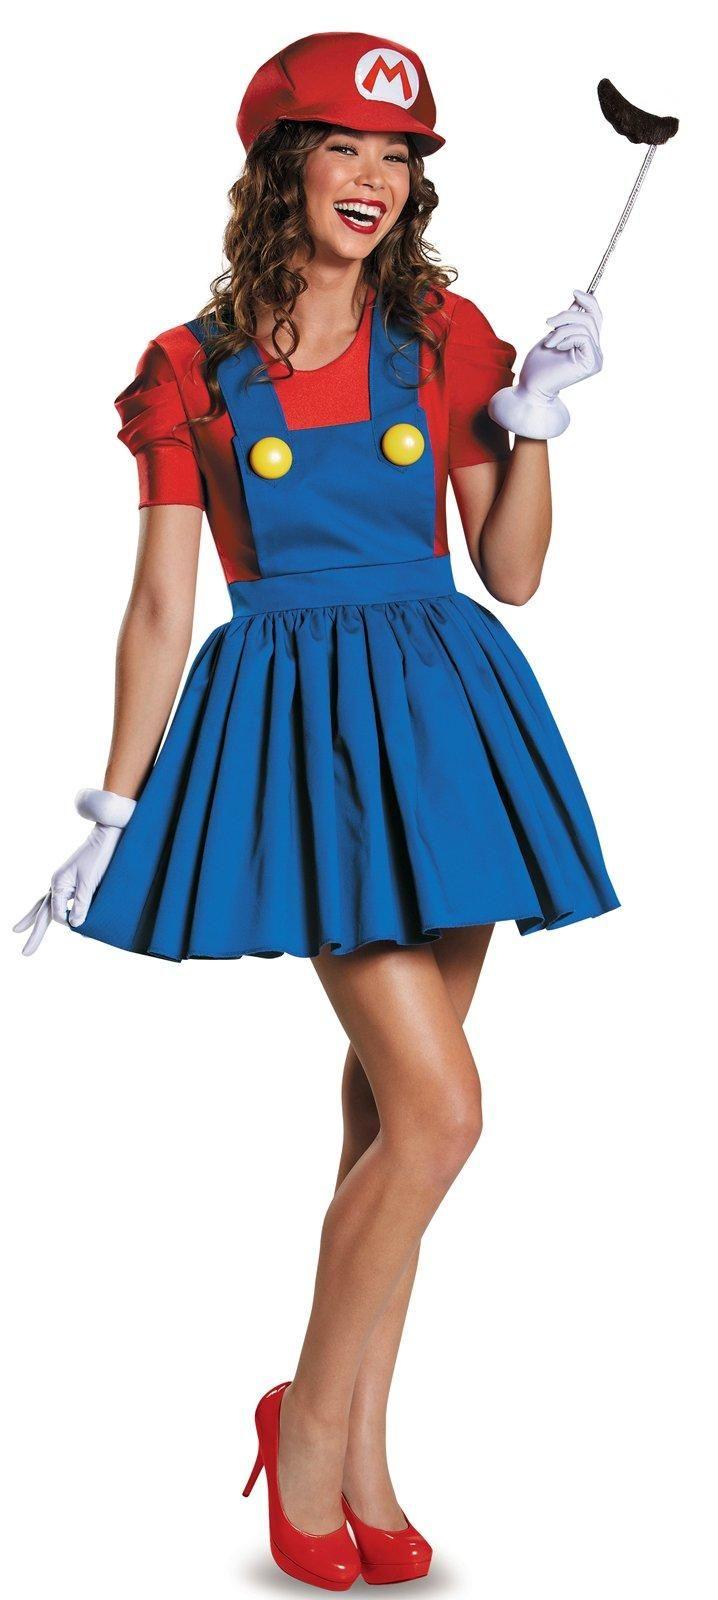 Super Mario: Mario w/Skirt Costume For Women from Buycostumes.com